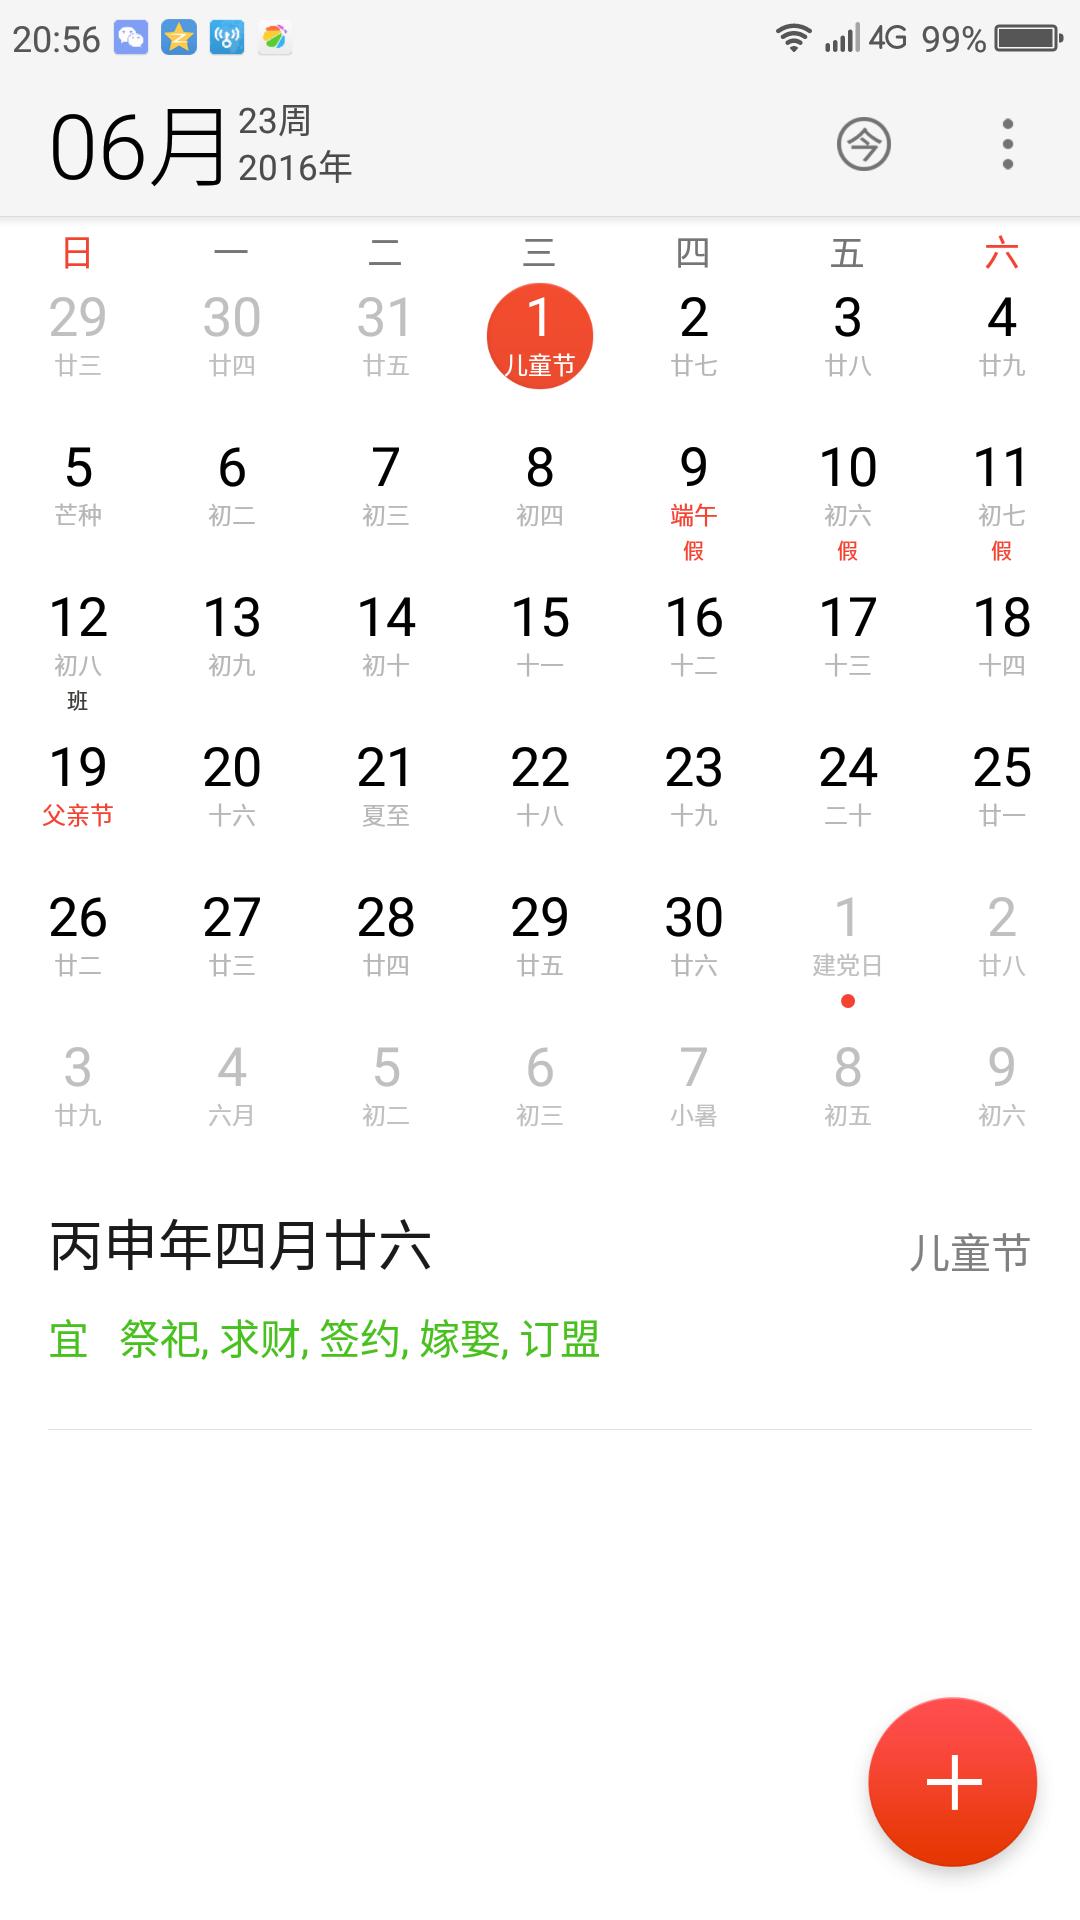 Screenshot_2016-08-07-20-56-38.png